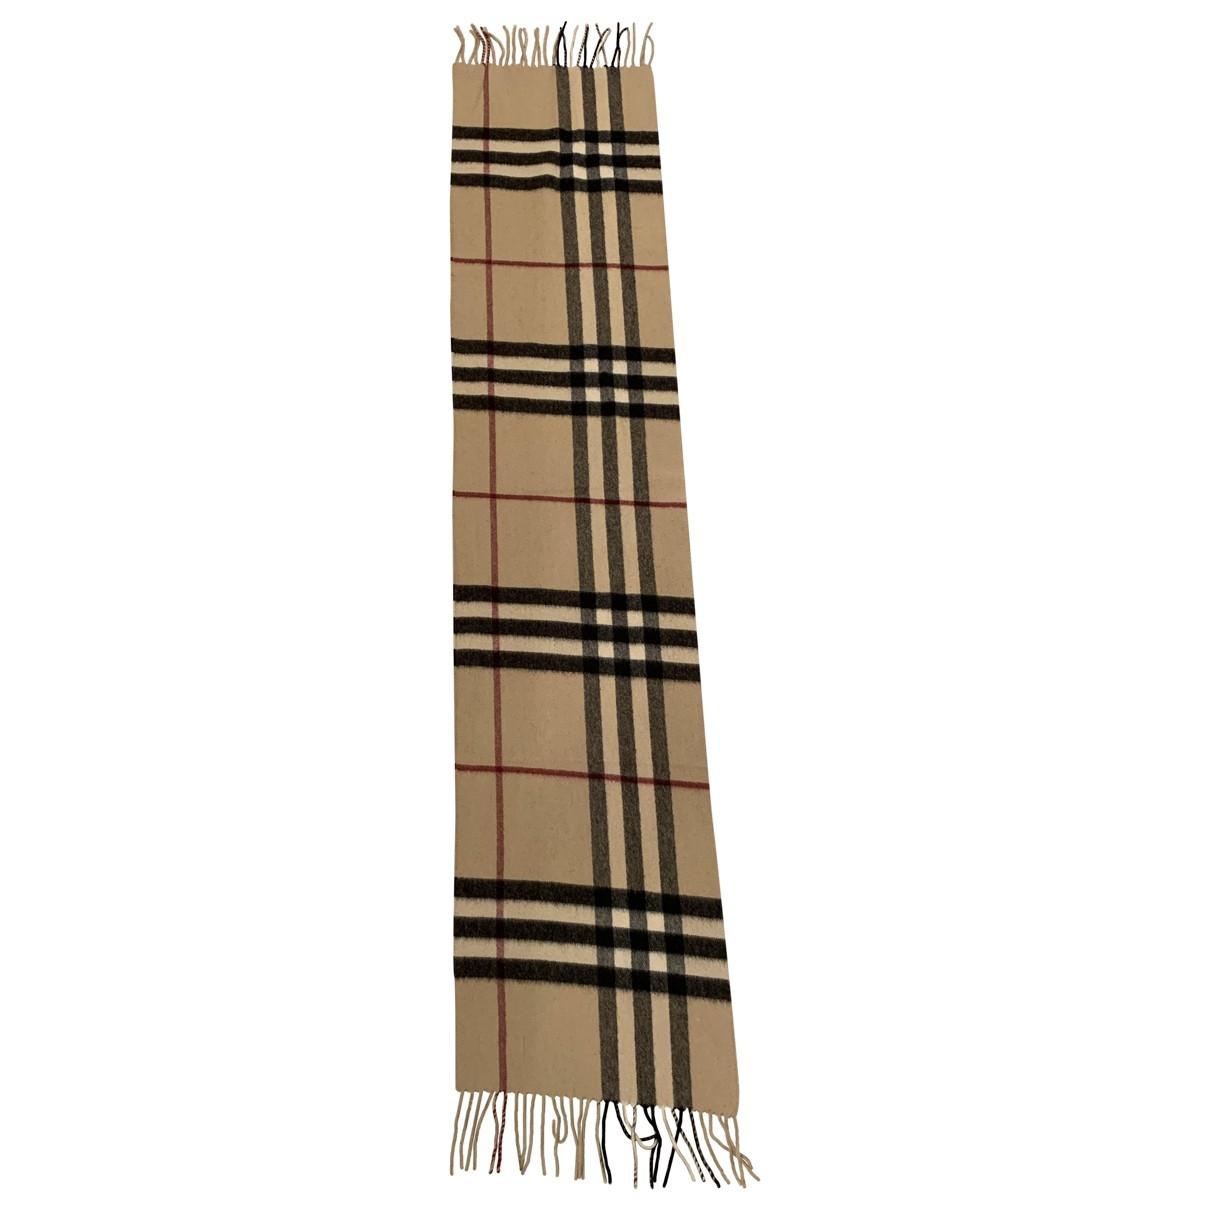 Burberry \N Beige Cashmere scarf for Women \N